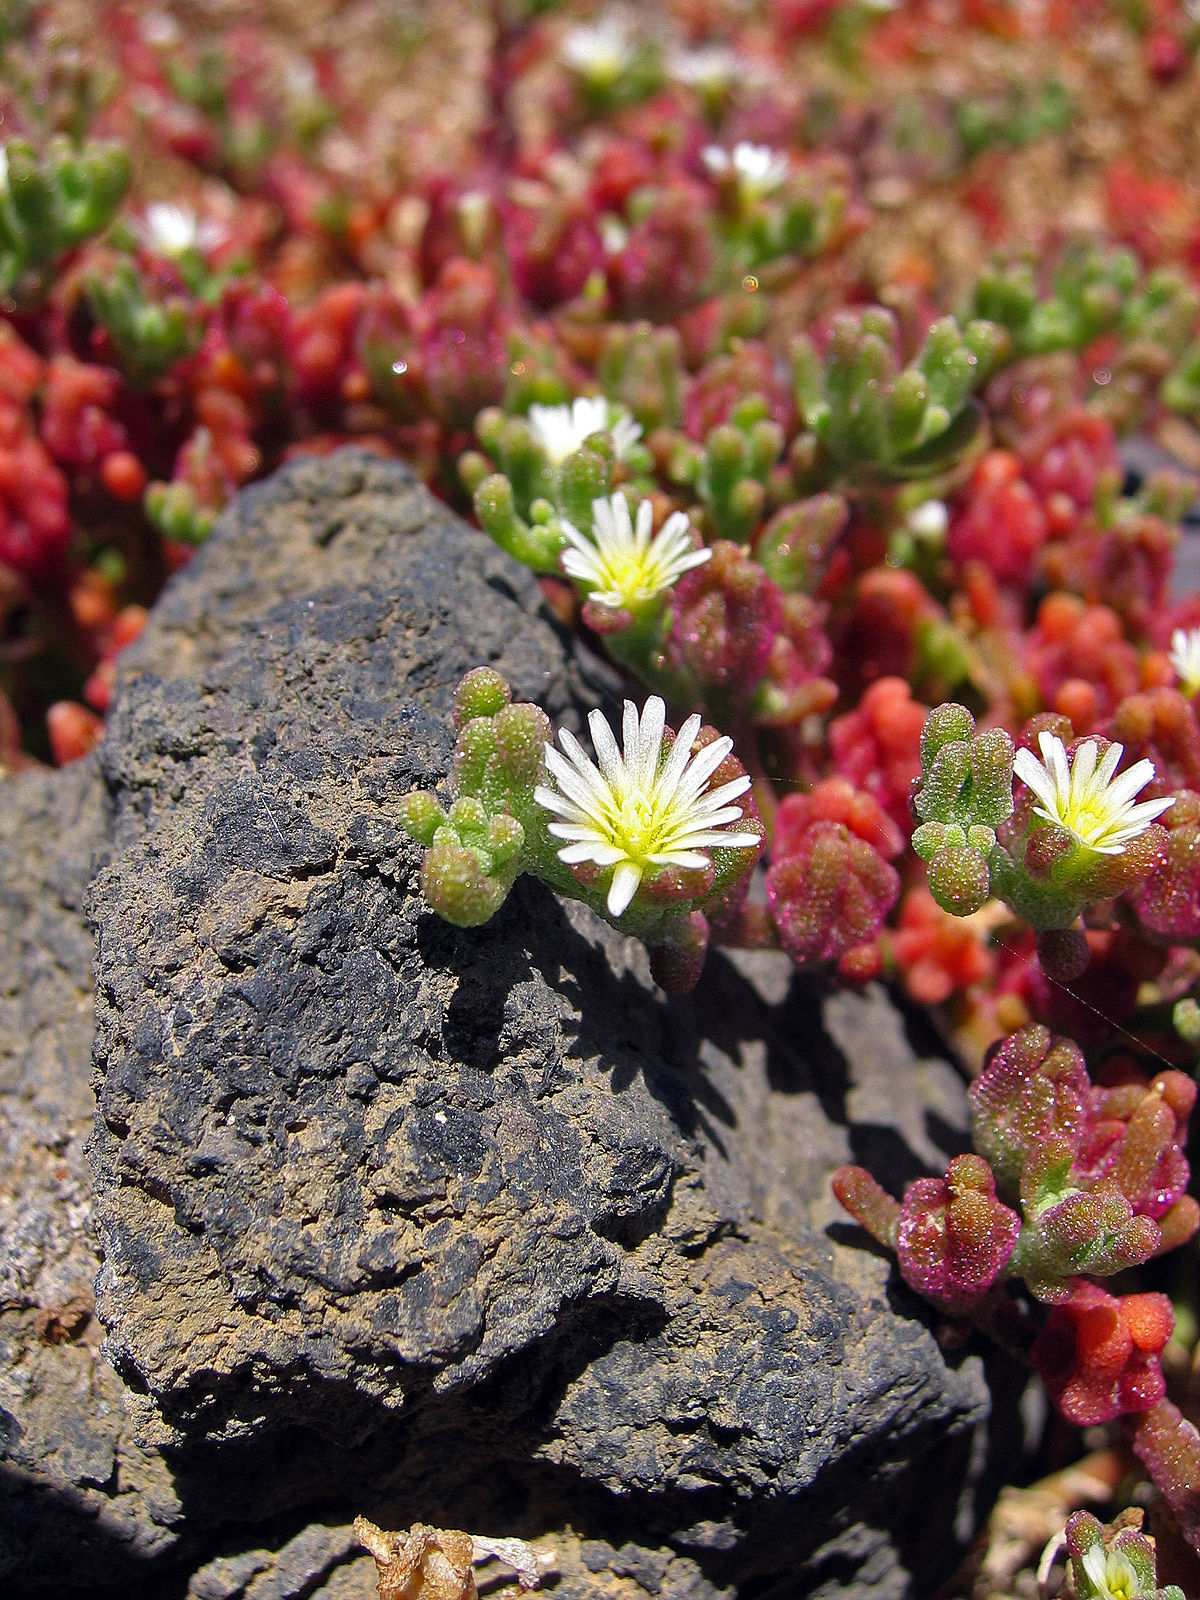 Mesembryanthemum Nodiflorum Wikipedia